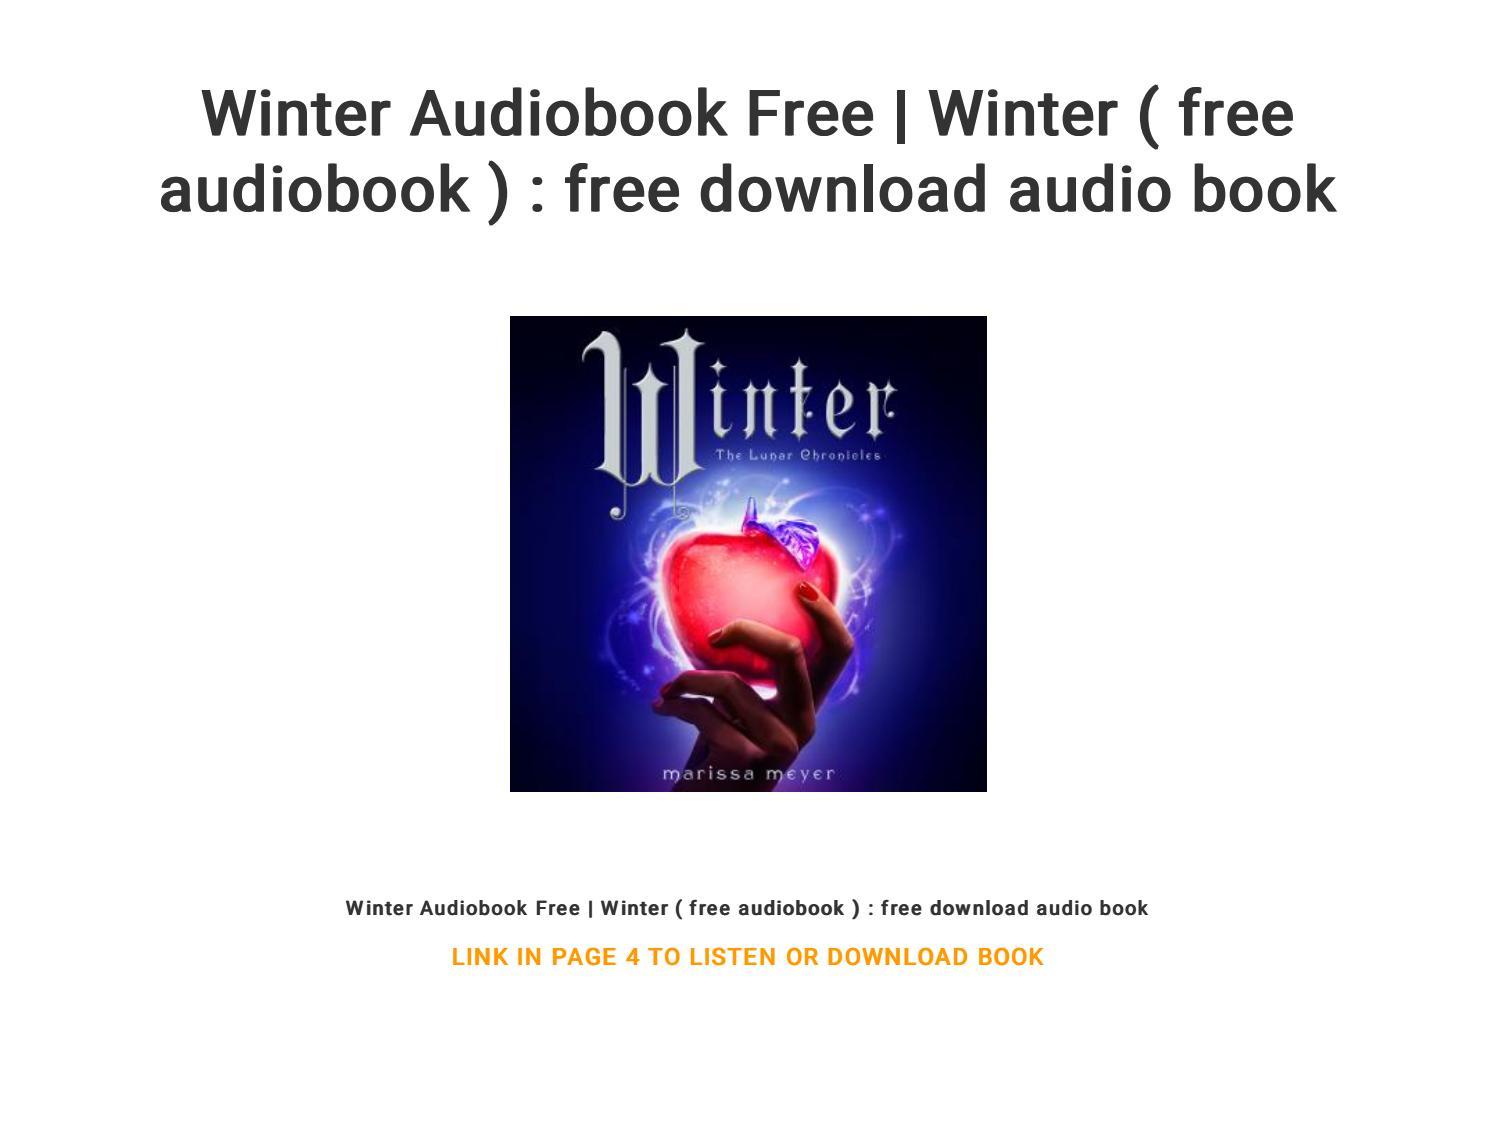 scarlet lunar chronicles audiobook free